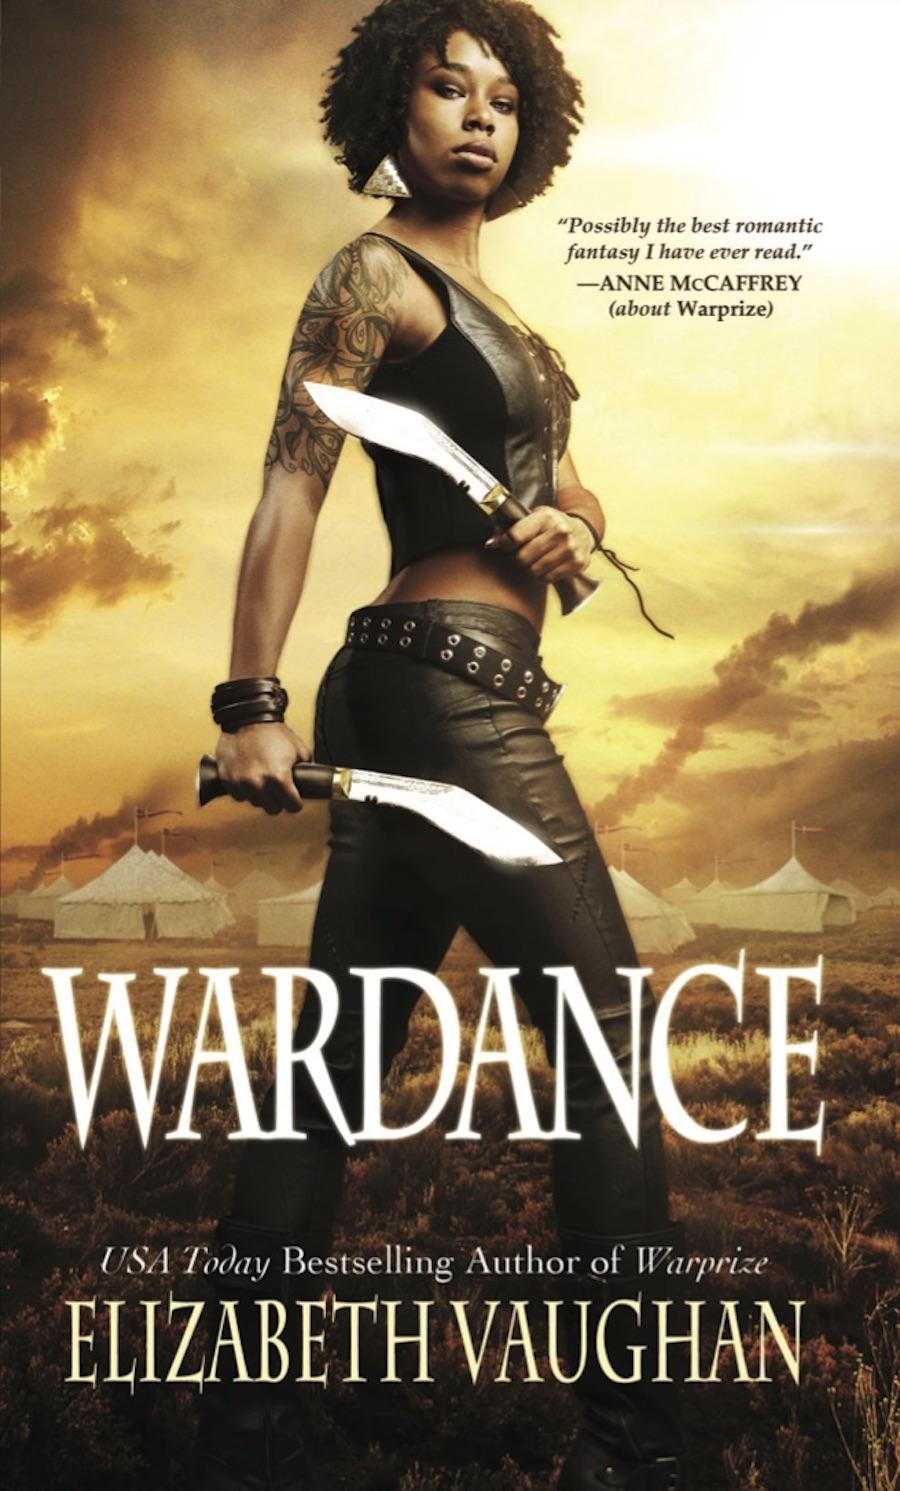 Wardance-Cover-TShore.jpg